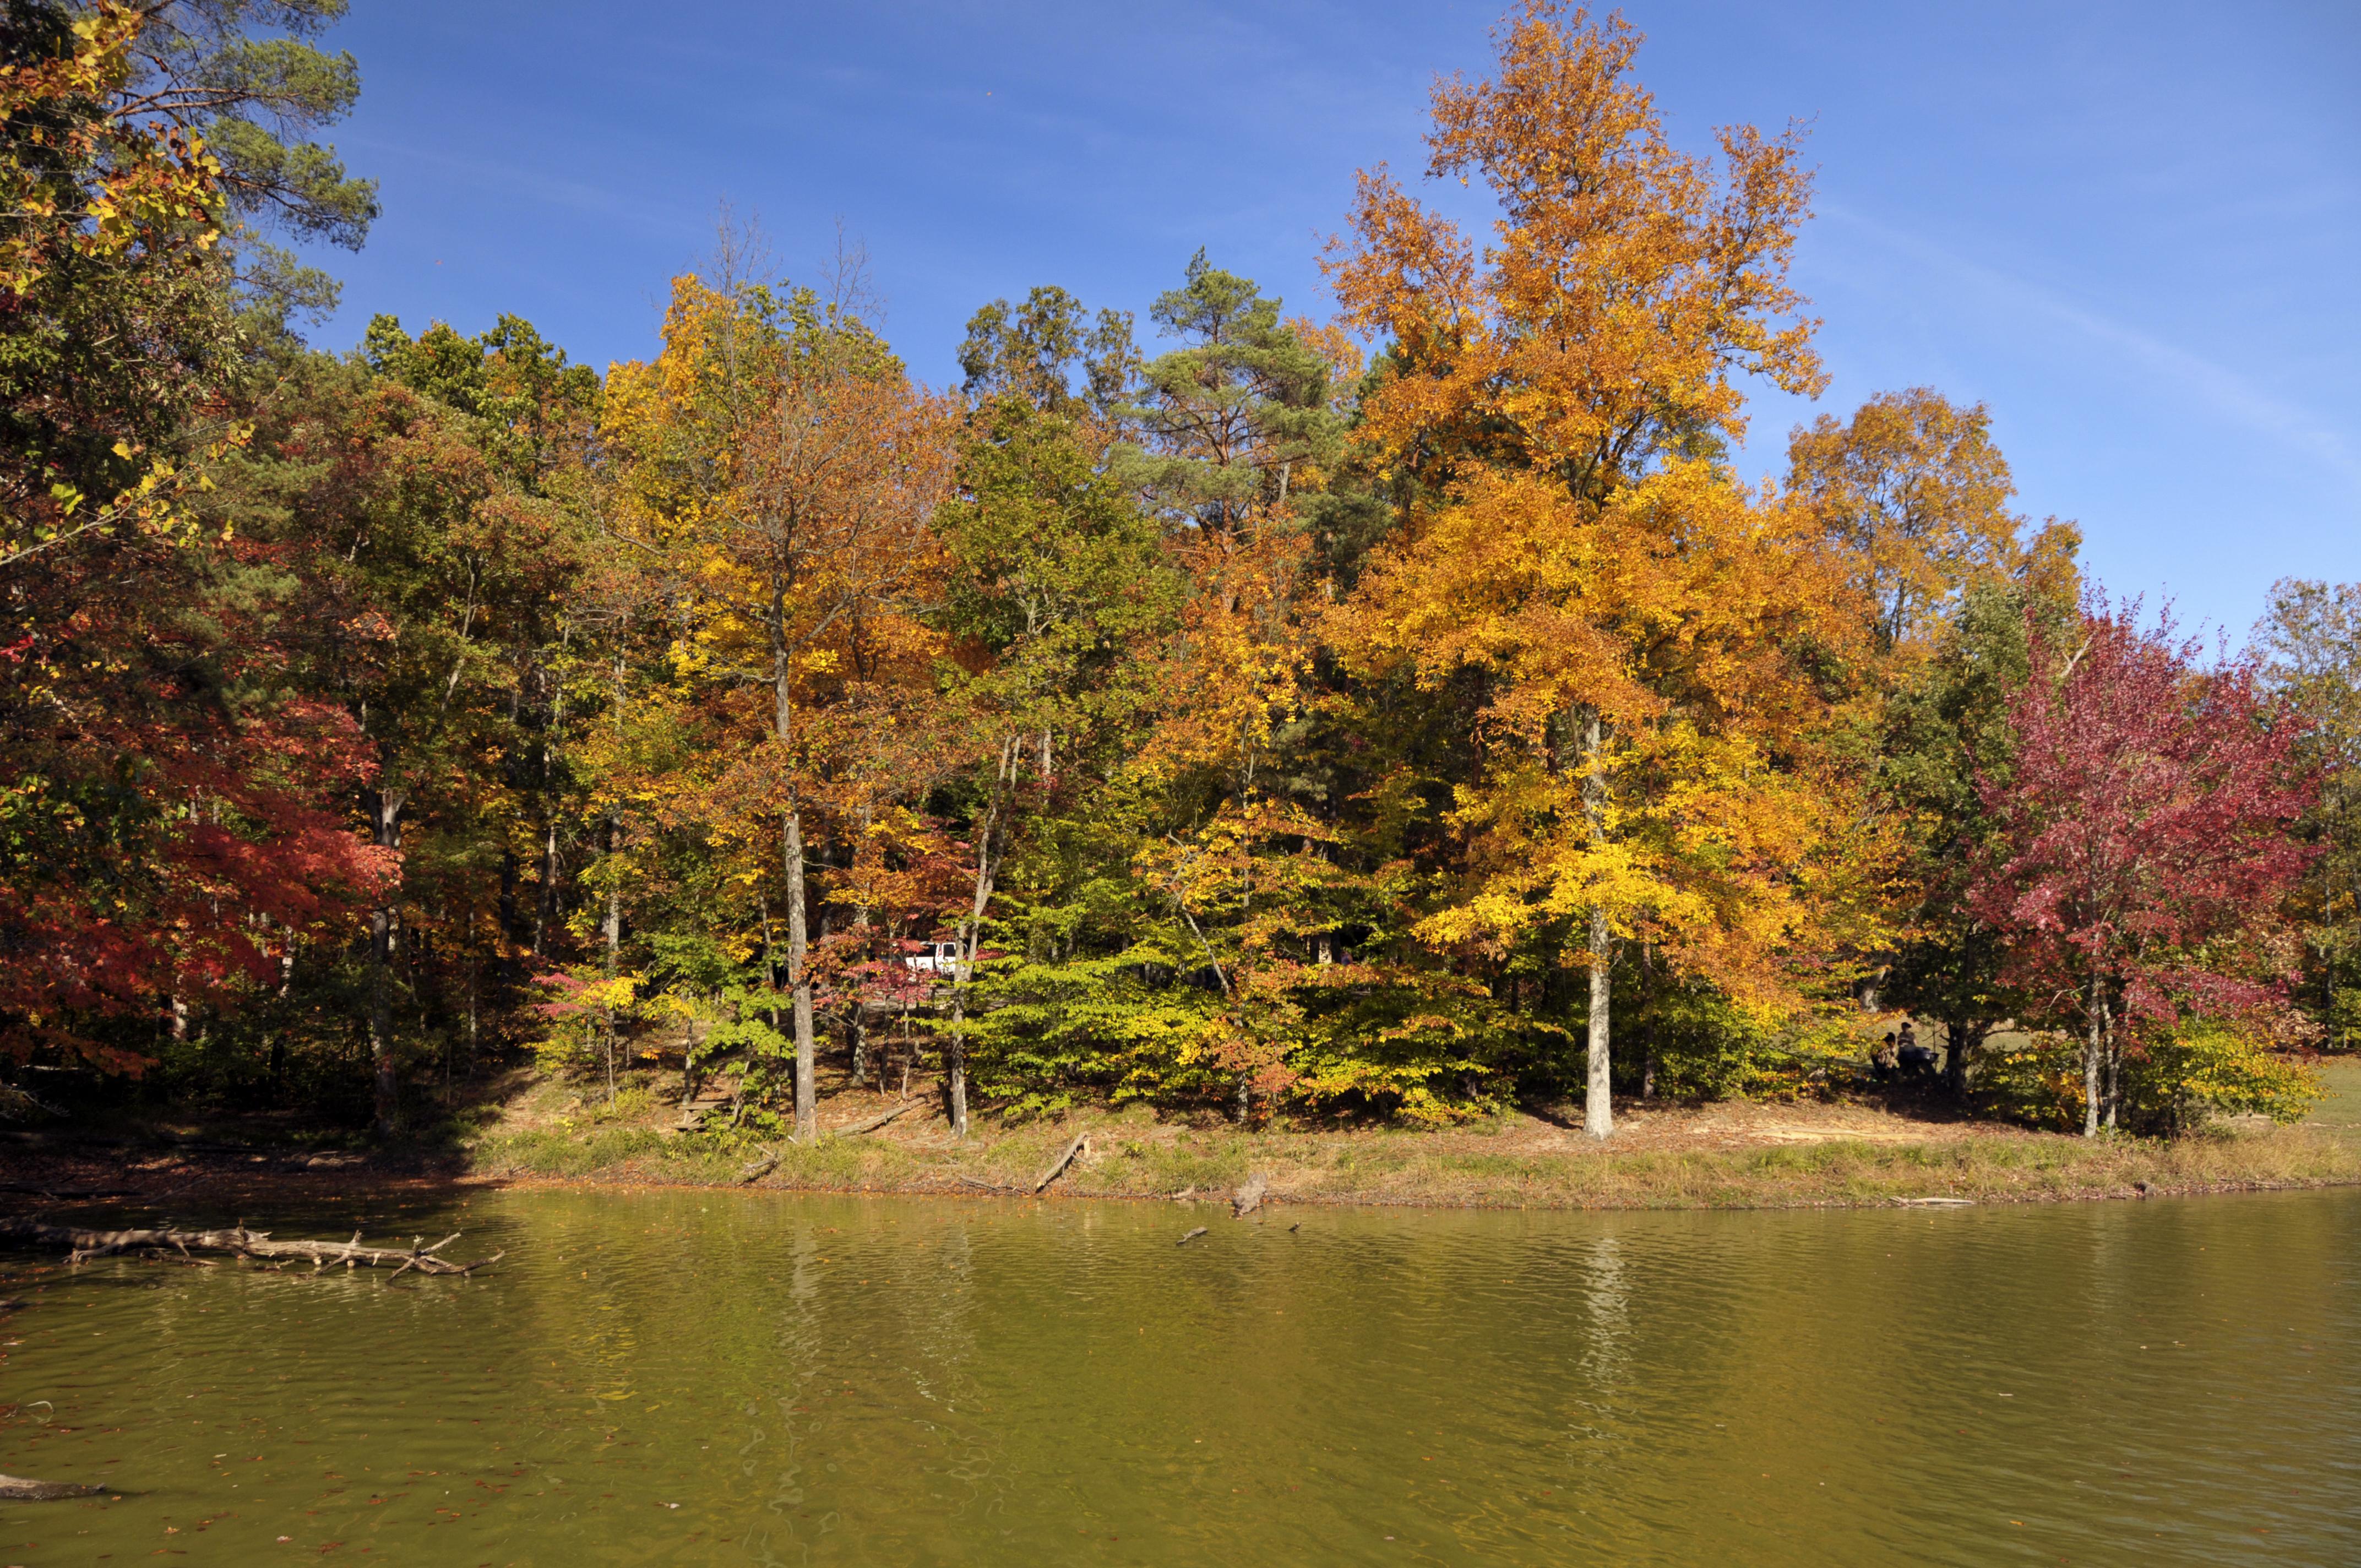 File:Brown County Lake, Indiana (2982445255).jpg - Wikimedia Commons